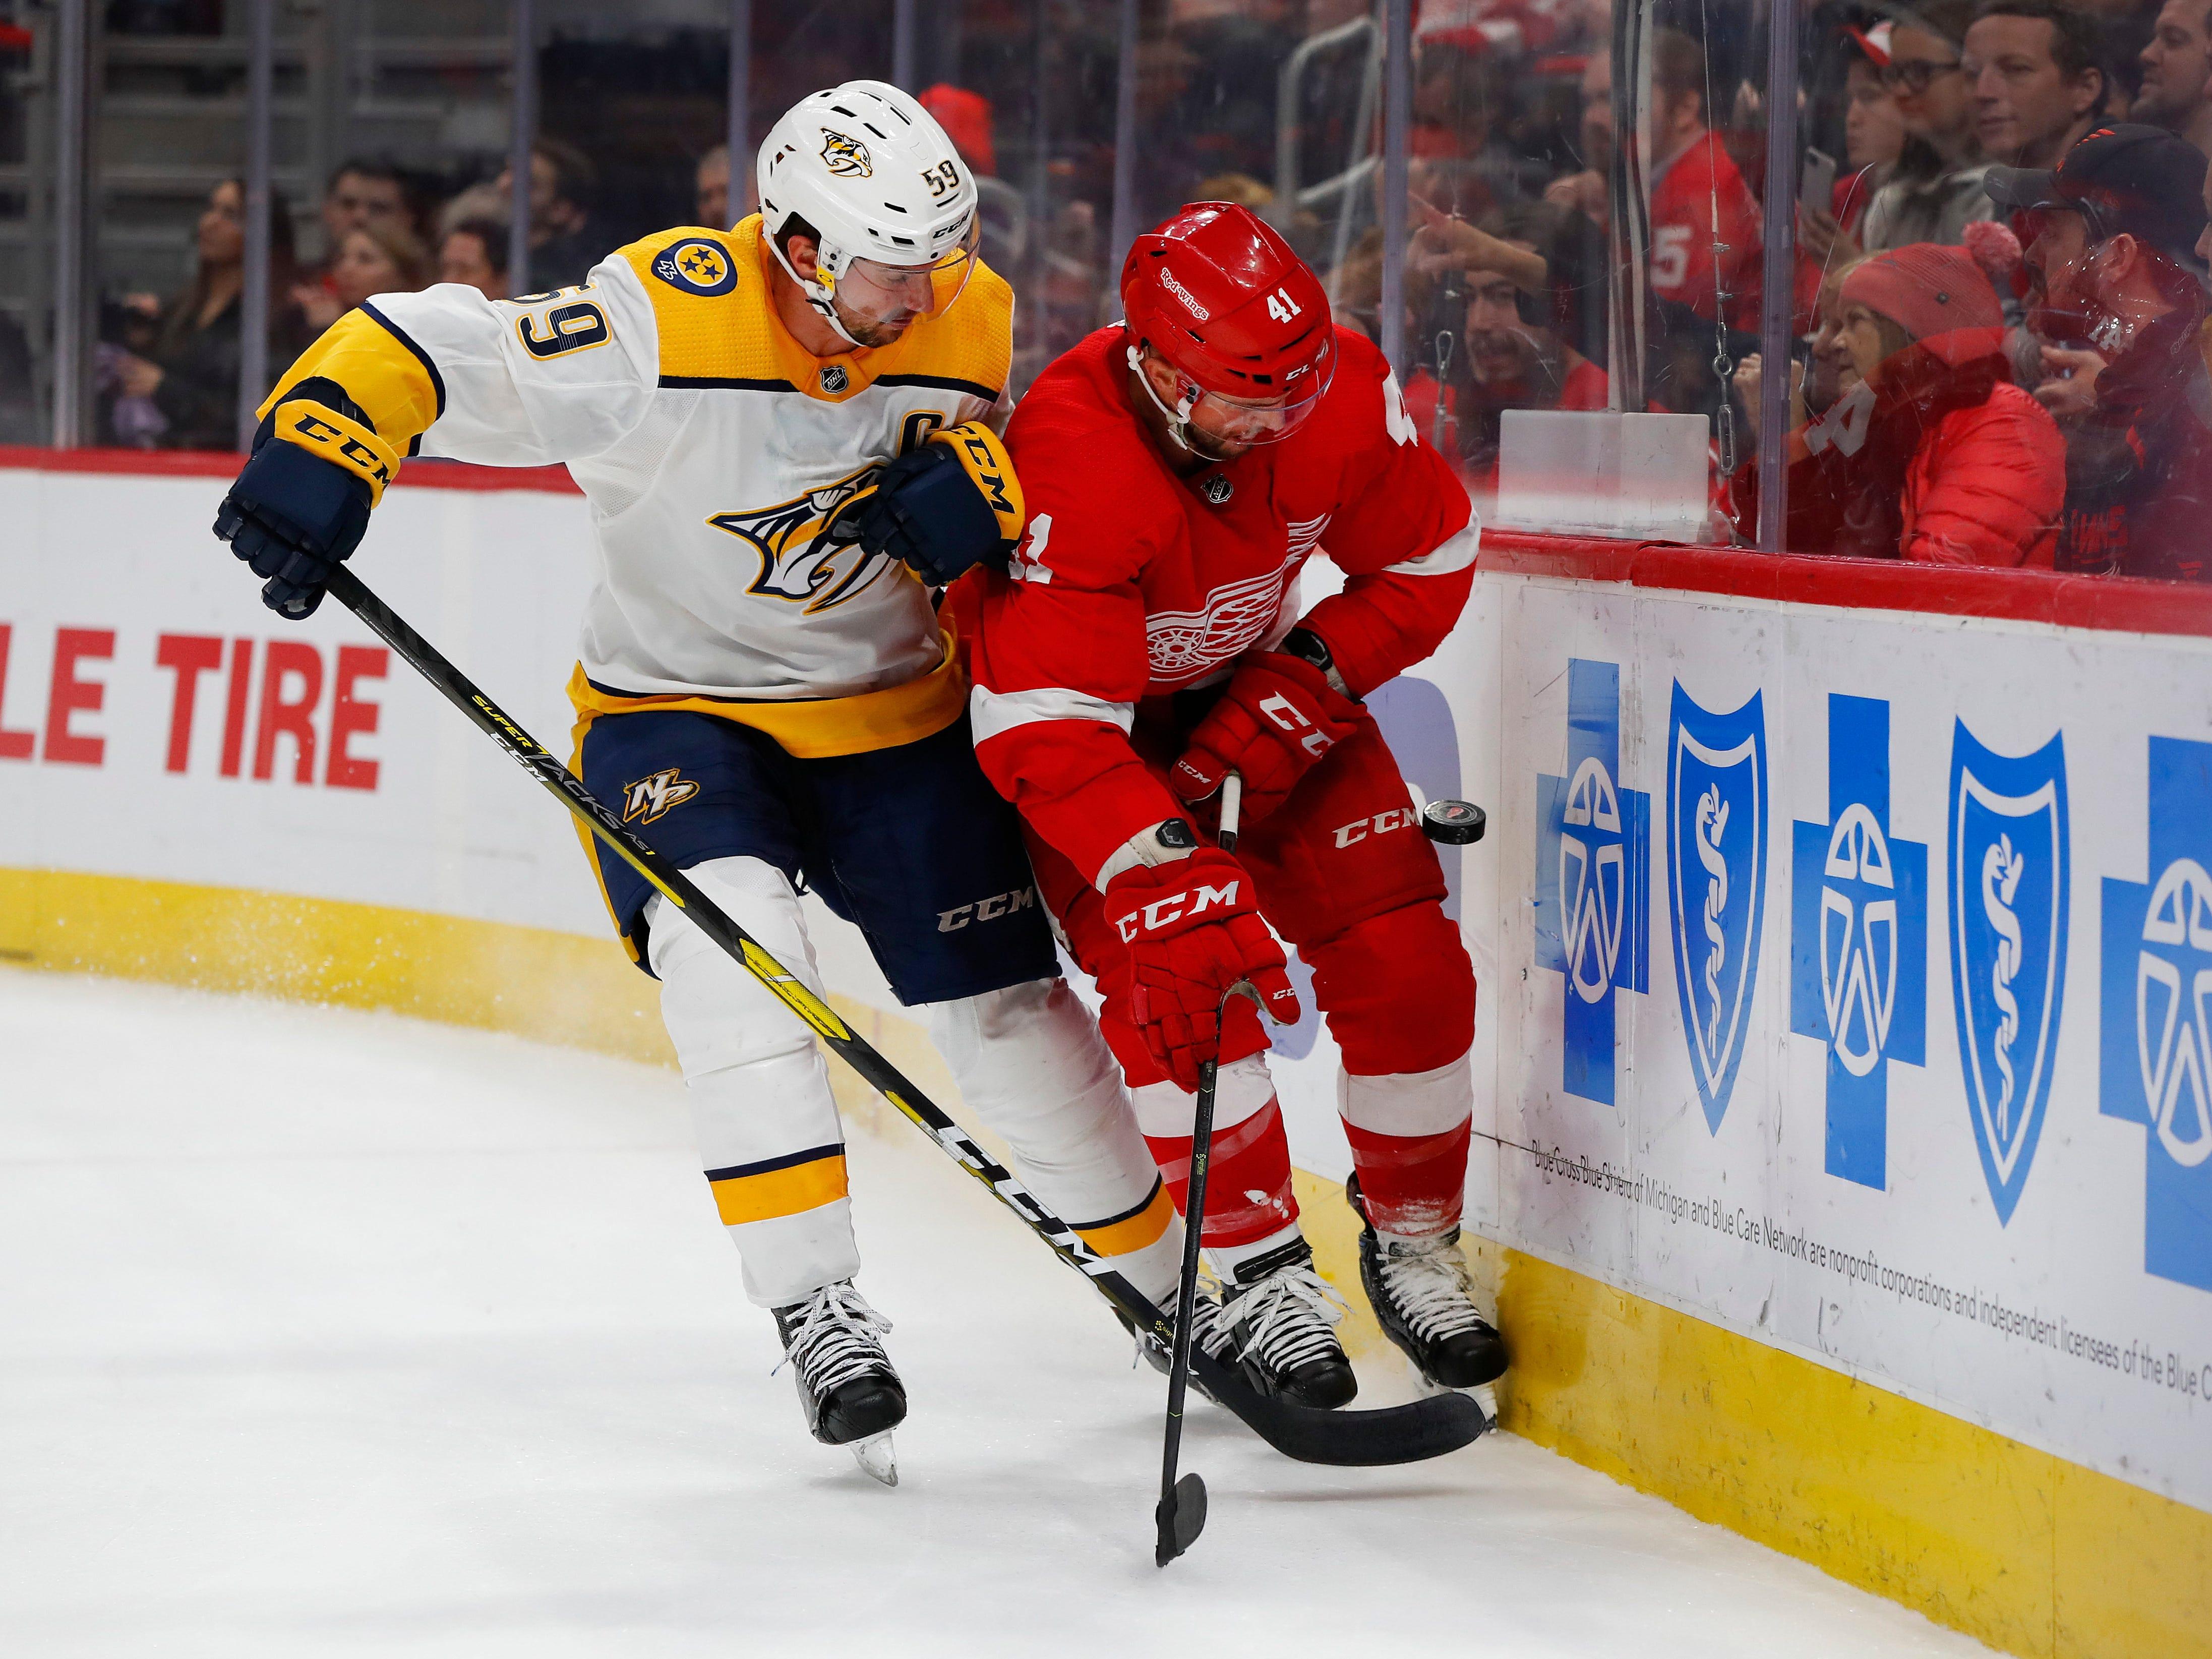 Nashville Predators defenseman Roman Josi (59) and Detroit Red Wings center Luke Glendening (41) battle for the puck in the third period.